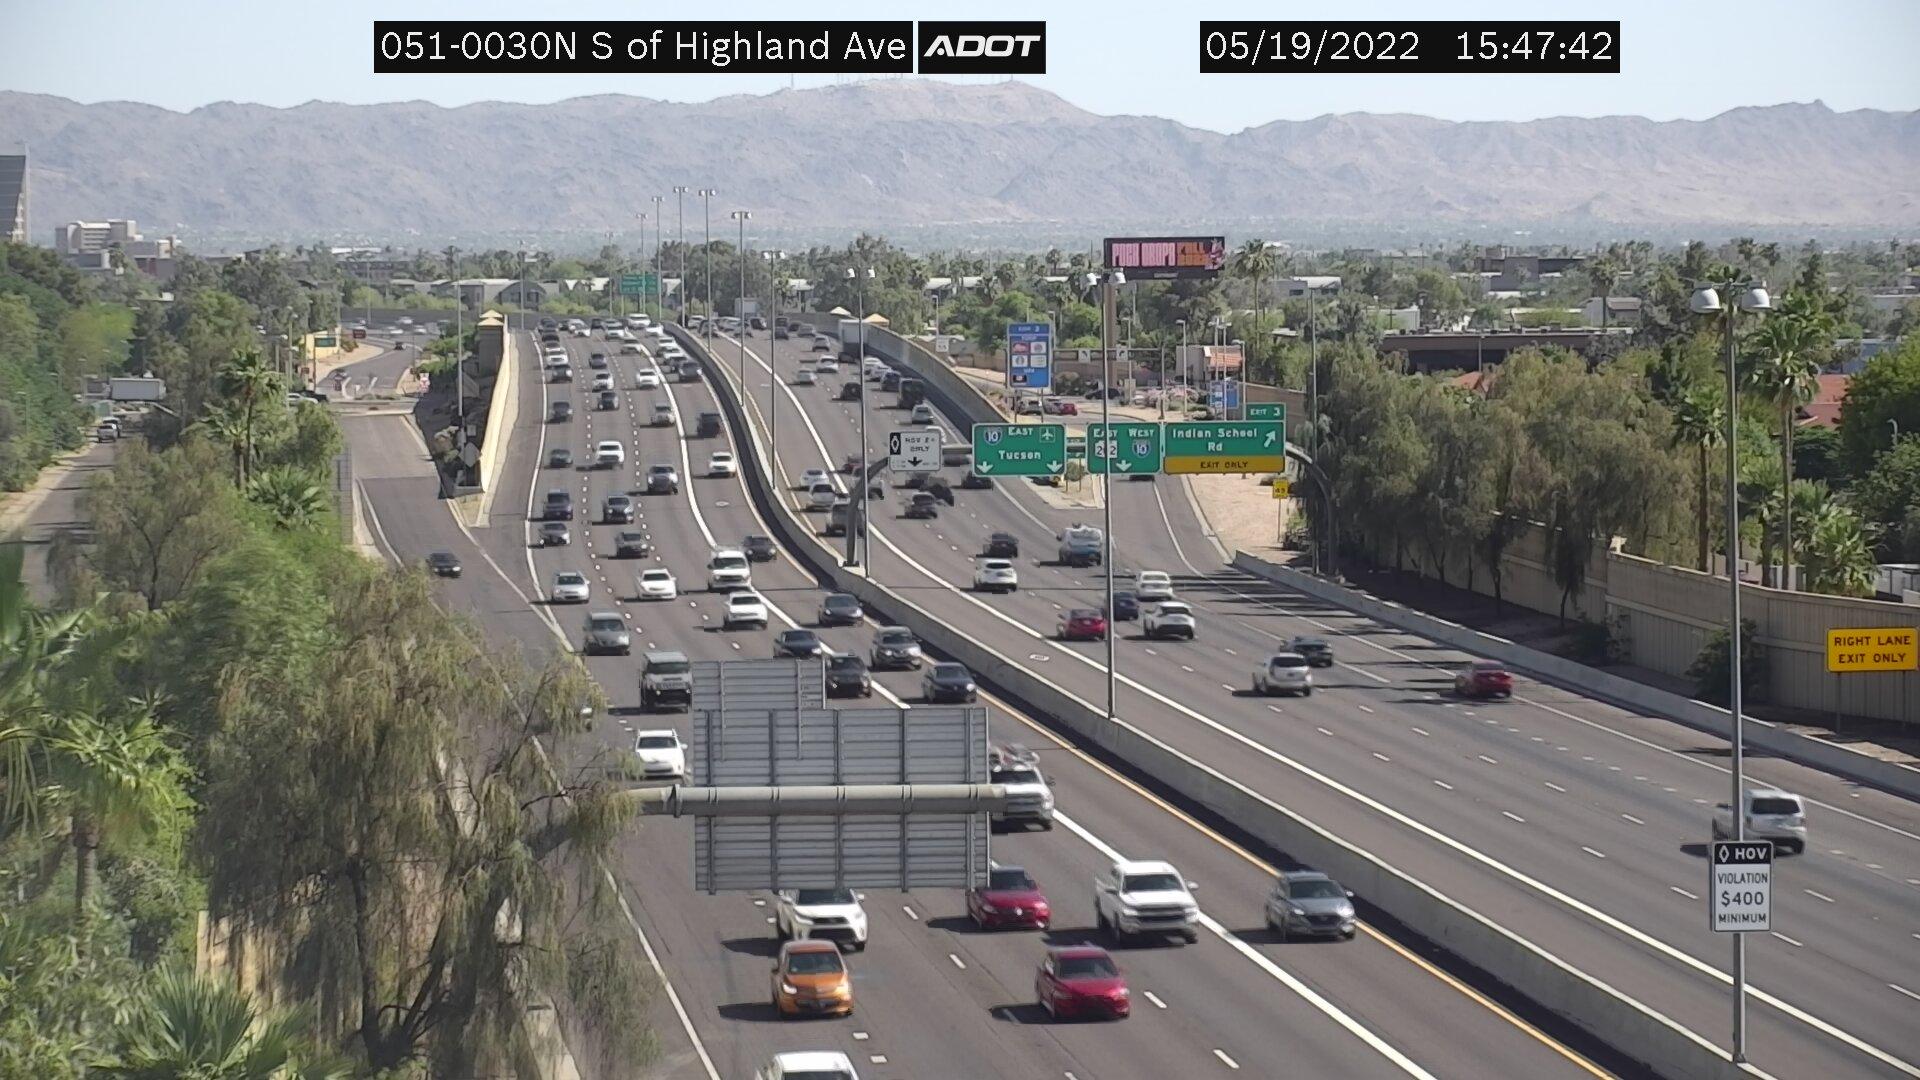 S of Highland NB (SR51) (077) - Phoenix and Arizona